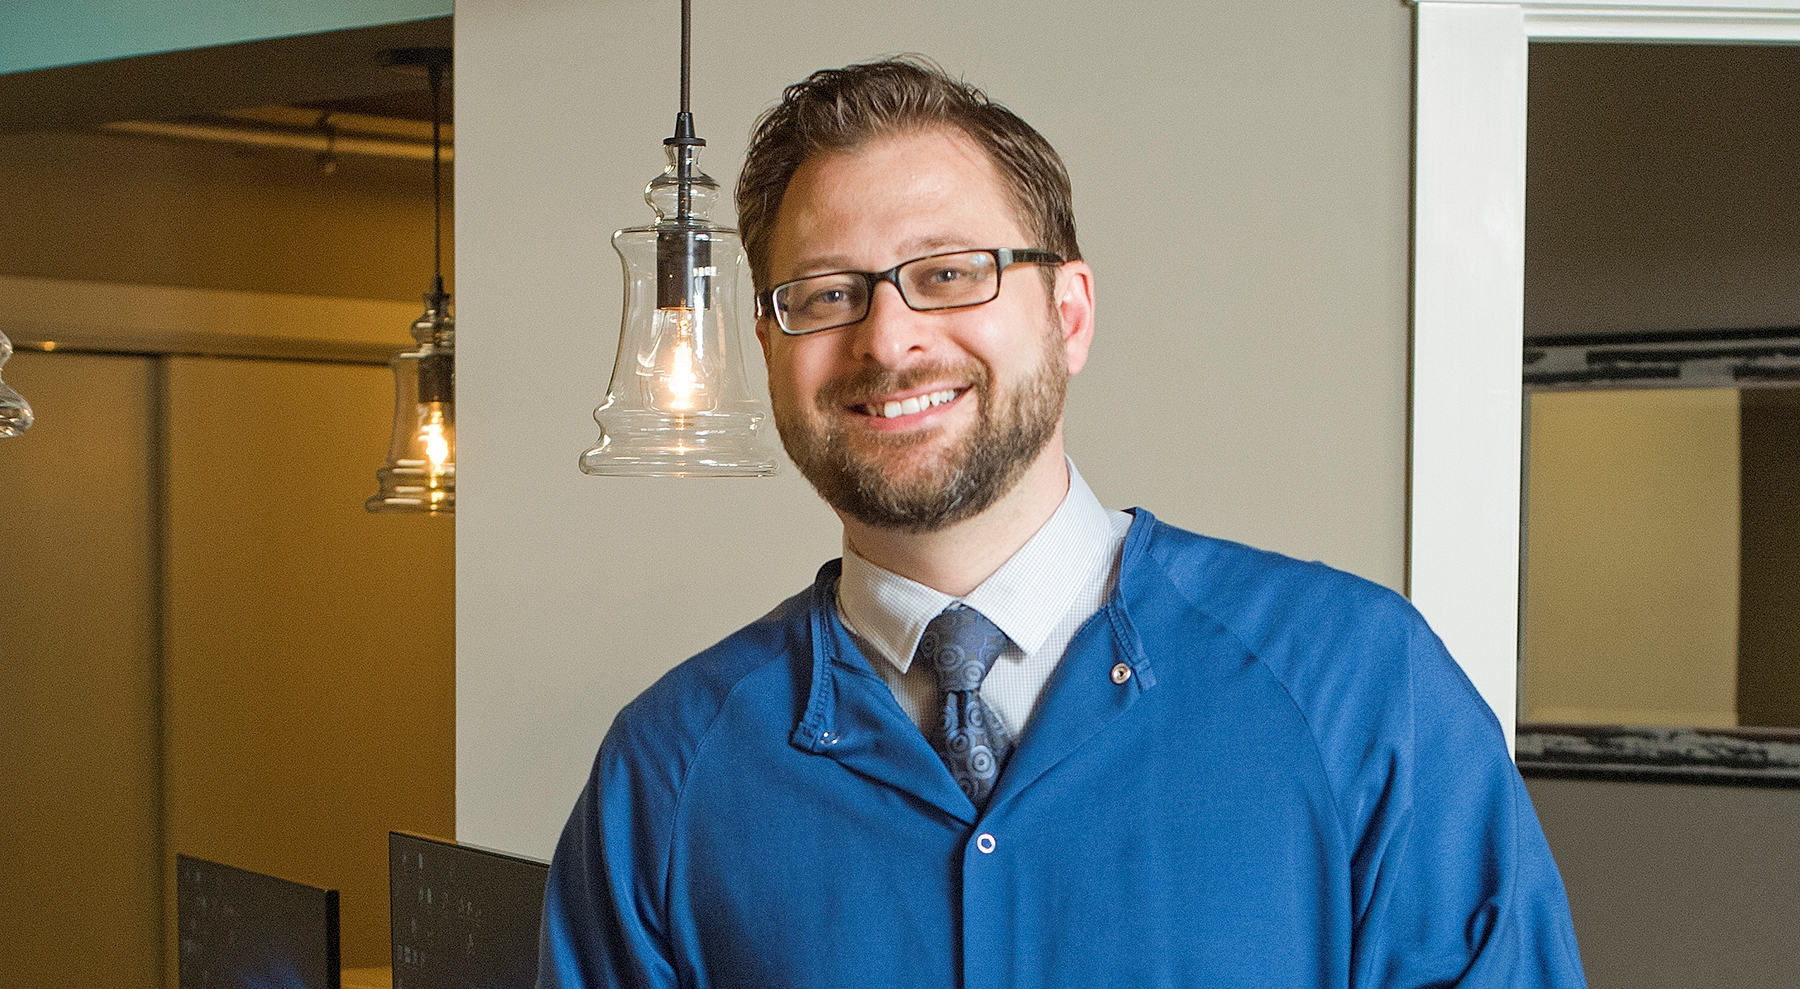 Nathan A. Swanson, D.D.S. / Newmarket Dental